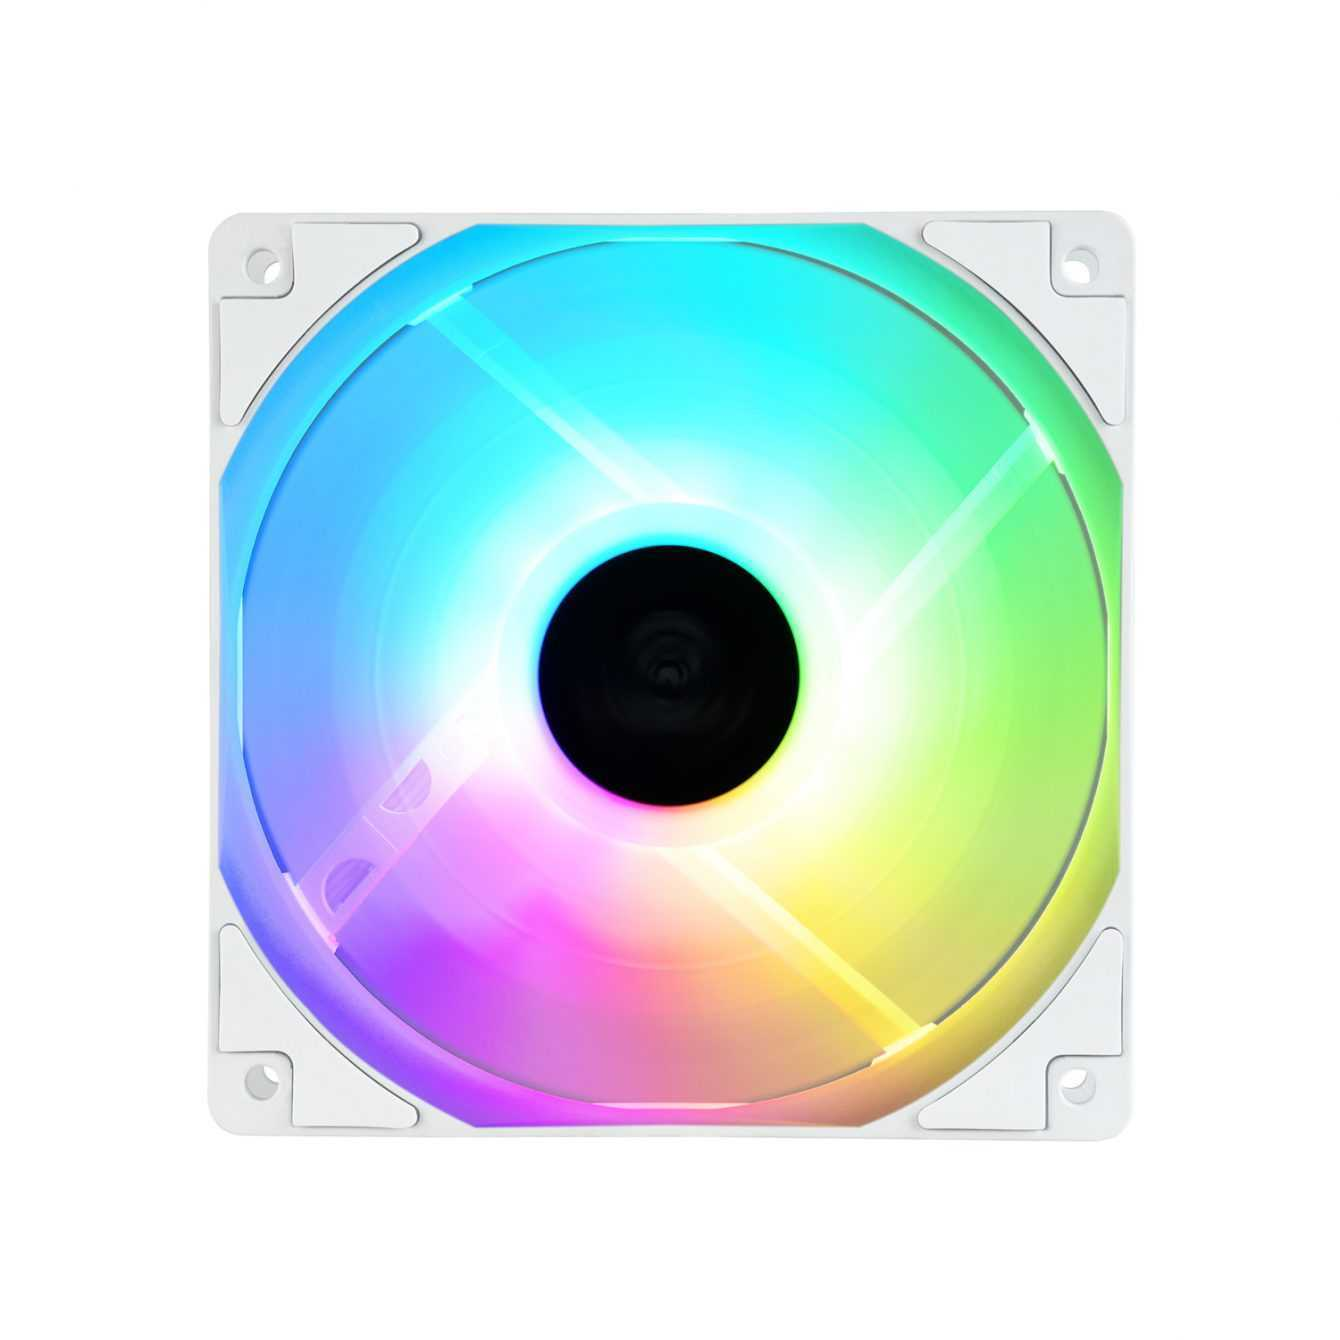 Enermax: Liqmax III ARGB 360 ora anche in versione bianca